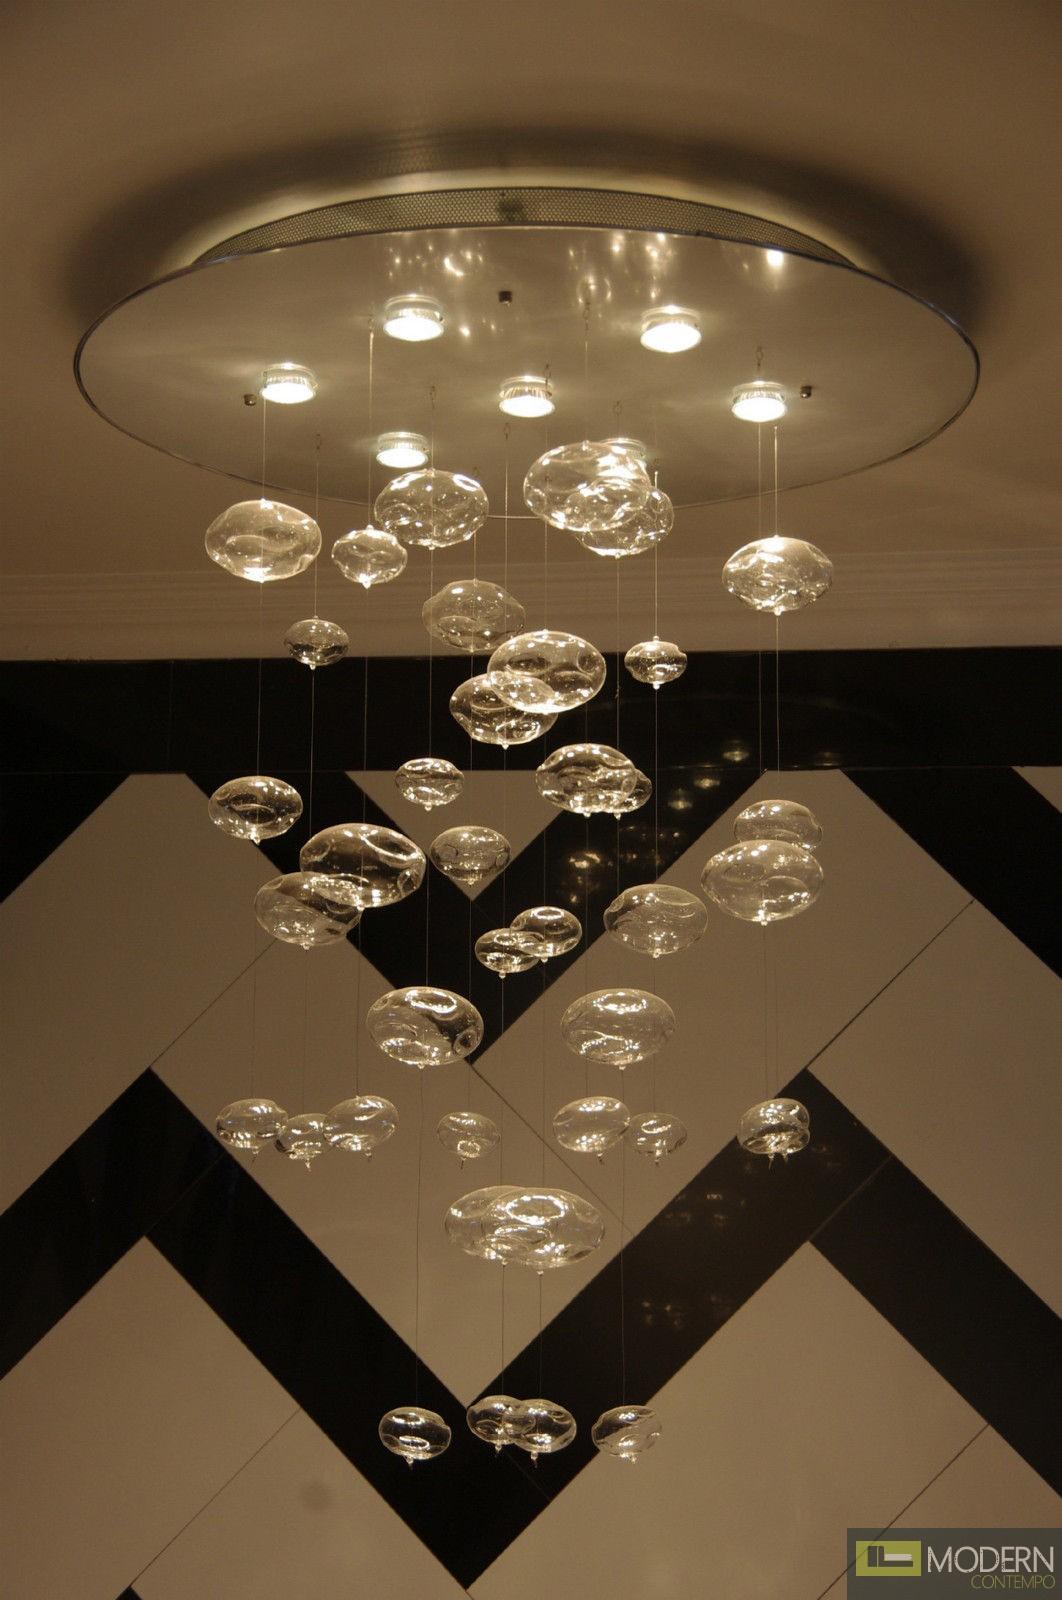 Modern Bubble Chandelier clear glass Orbs Ceiling Pendant  : kgrhqvlefilrwewn6bsq2eej2mg6057 from moderncontempo.com size 1062 x 1600 jpeg 238kB